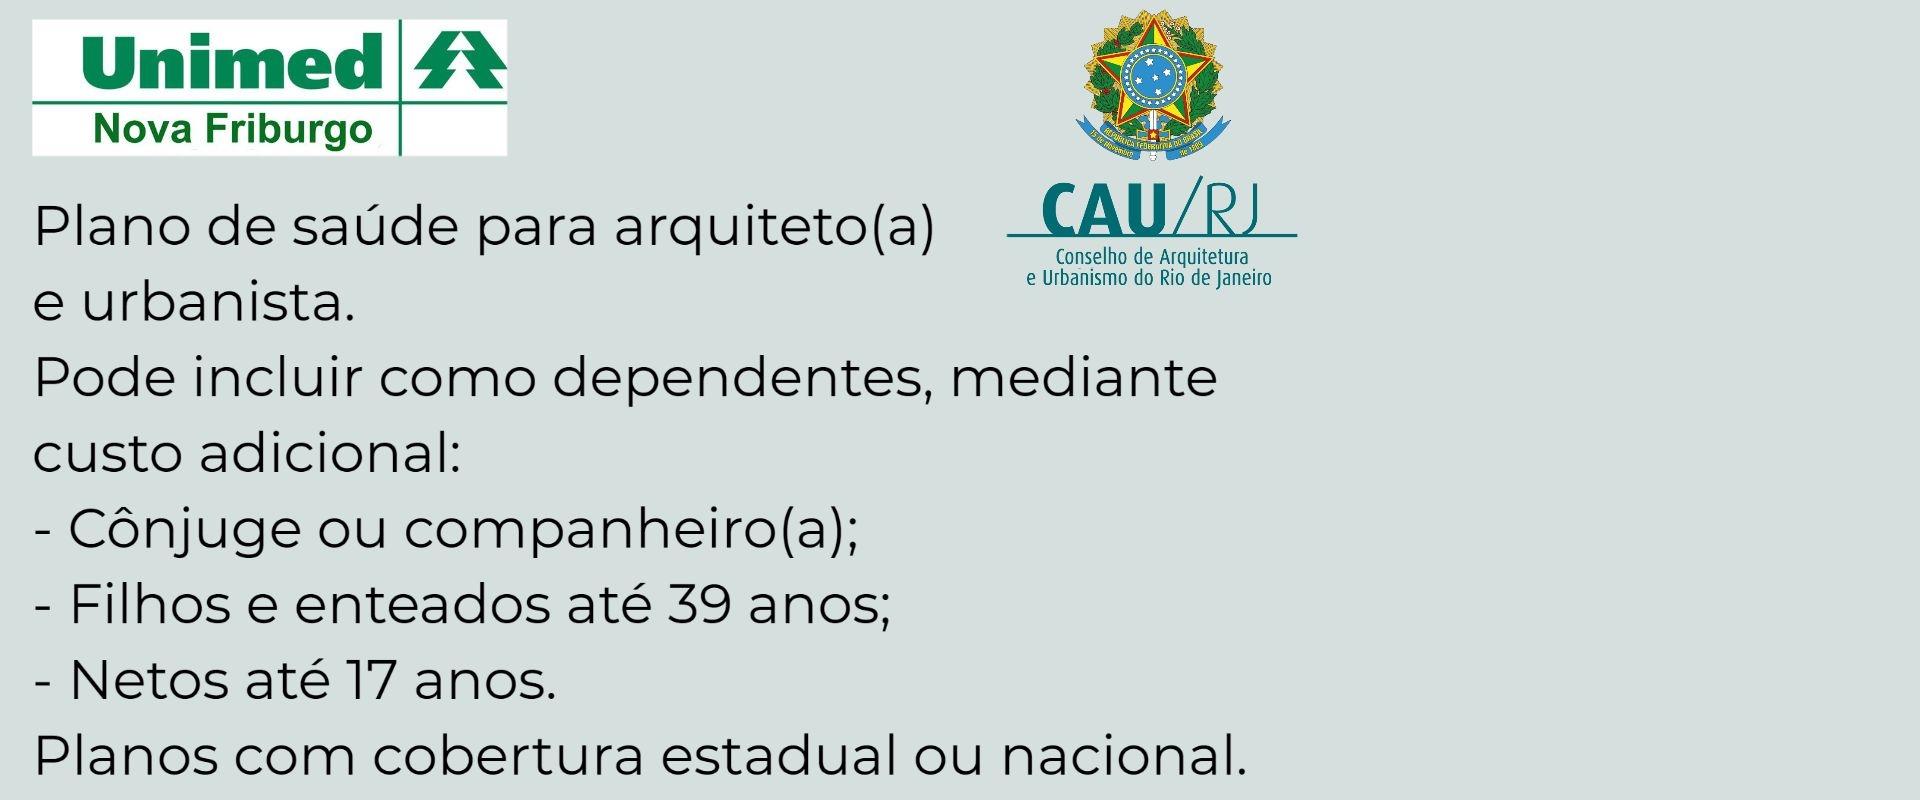 Unimed Nova Friburgo CAU-RJ